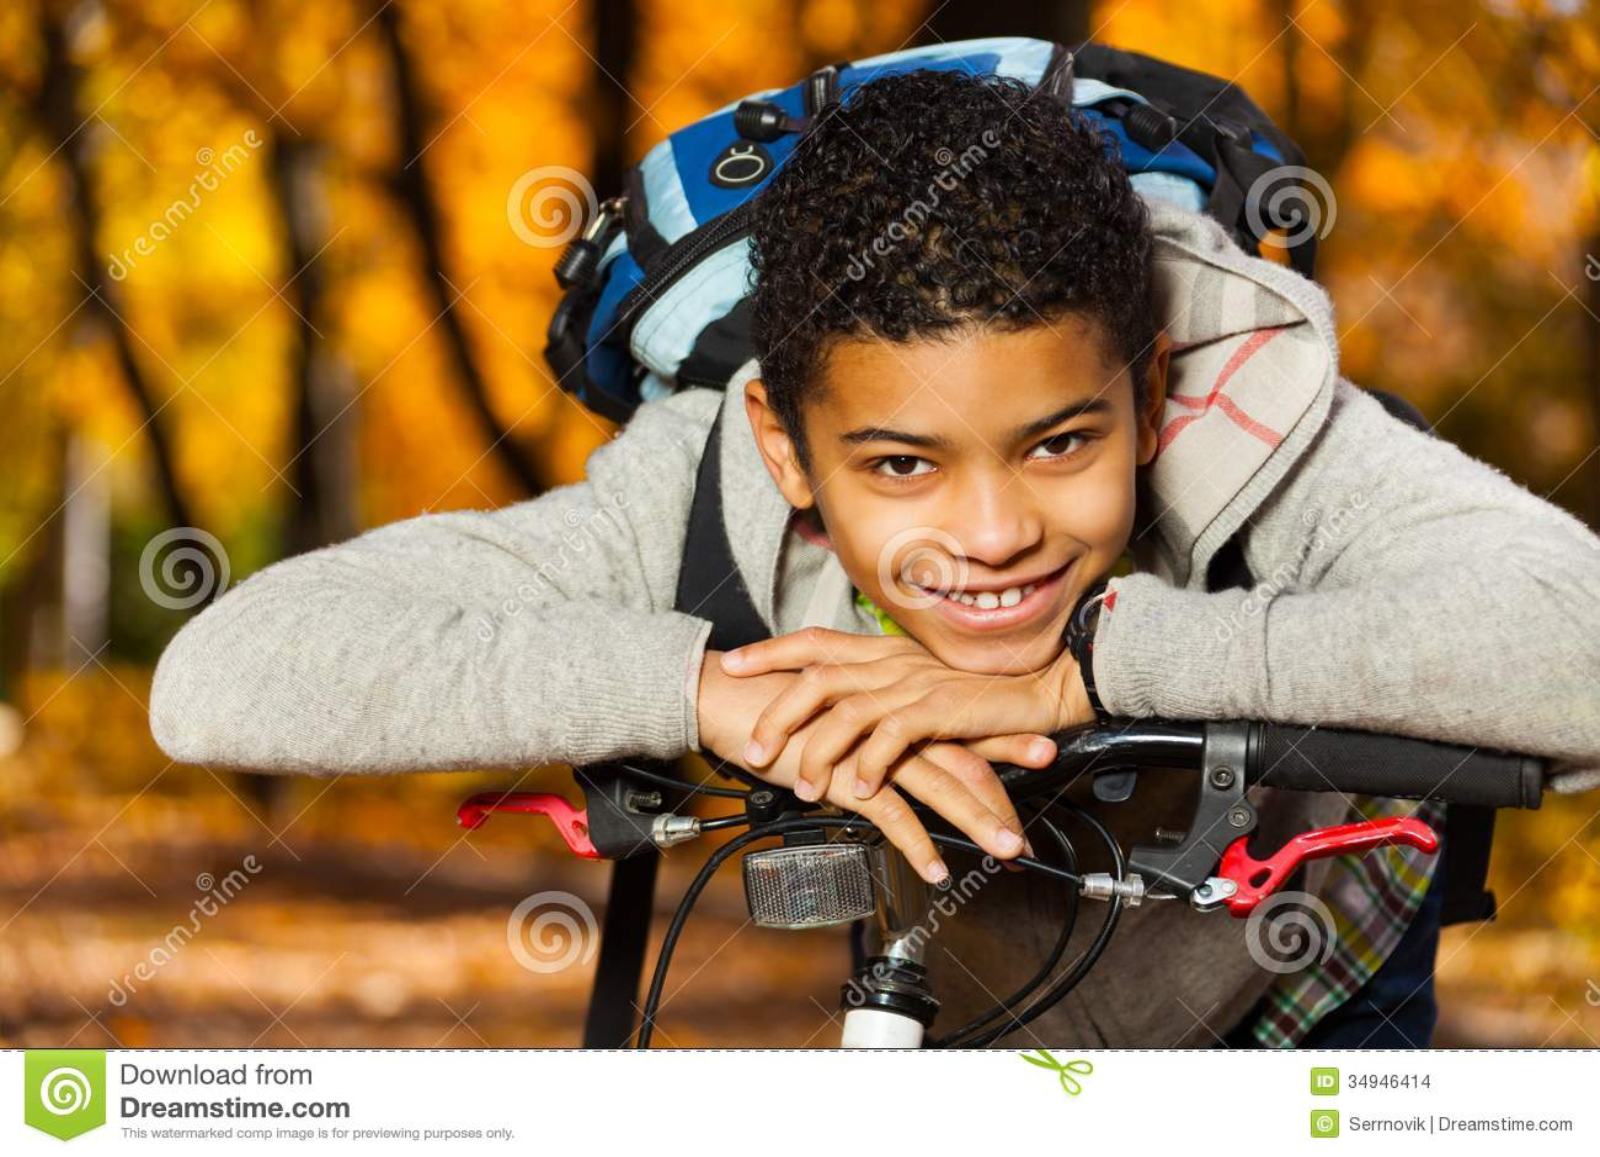 Boy Smile Laying On Bike Stern Stock Images Image 34946414